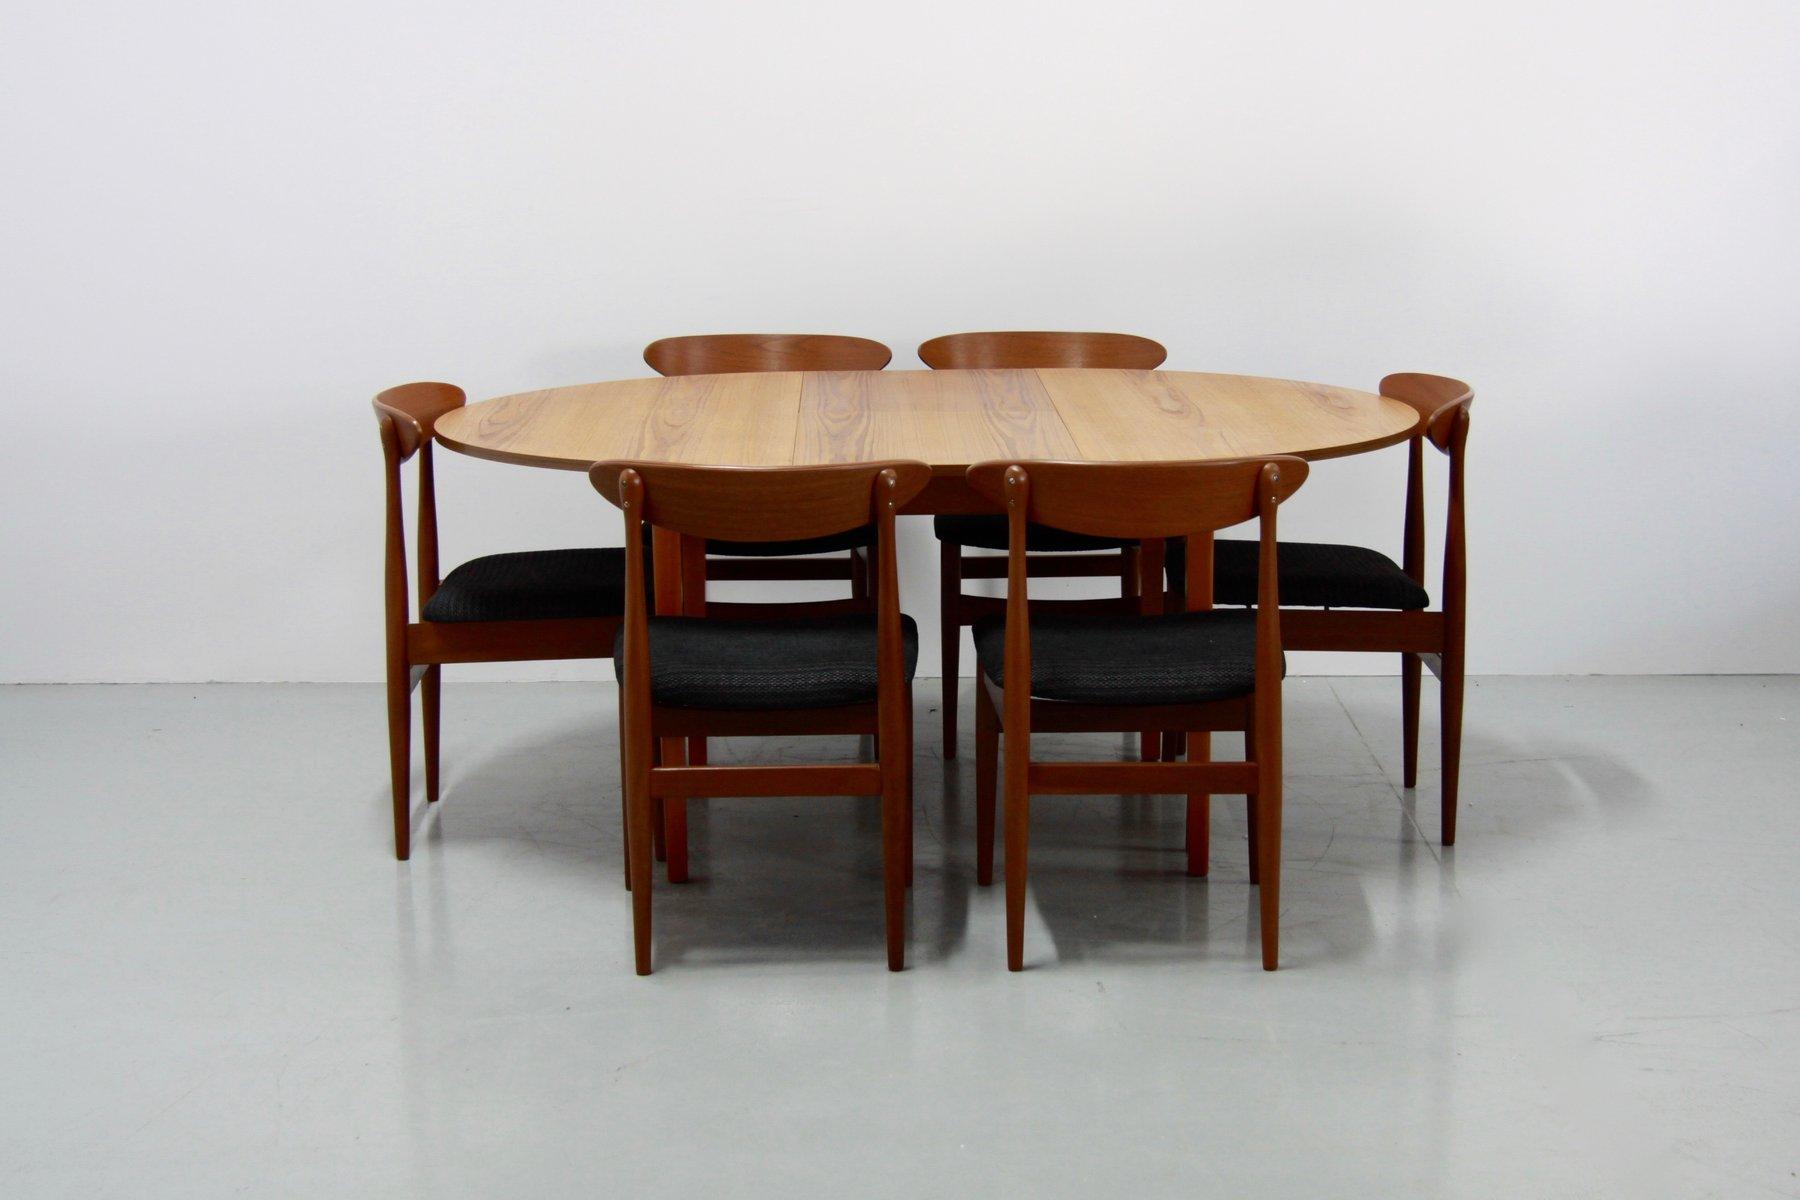 Superb Vintage Danish Extendable Teak Dining Table, 1960s